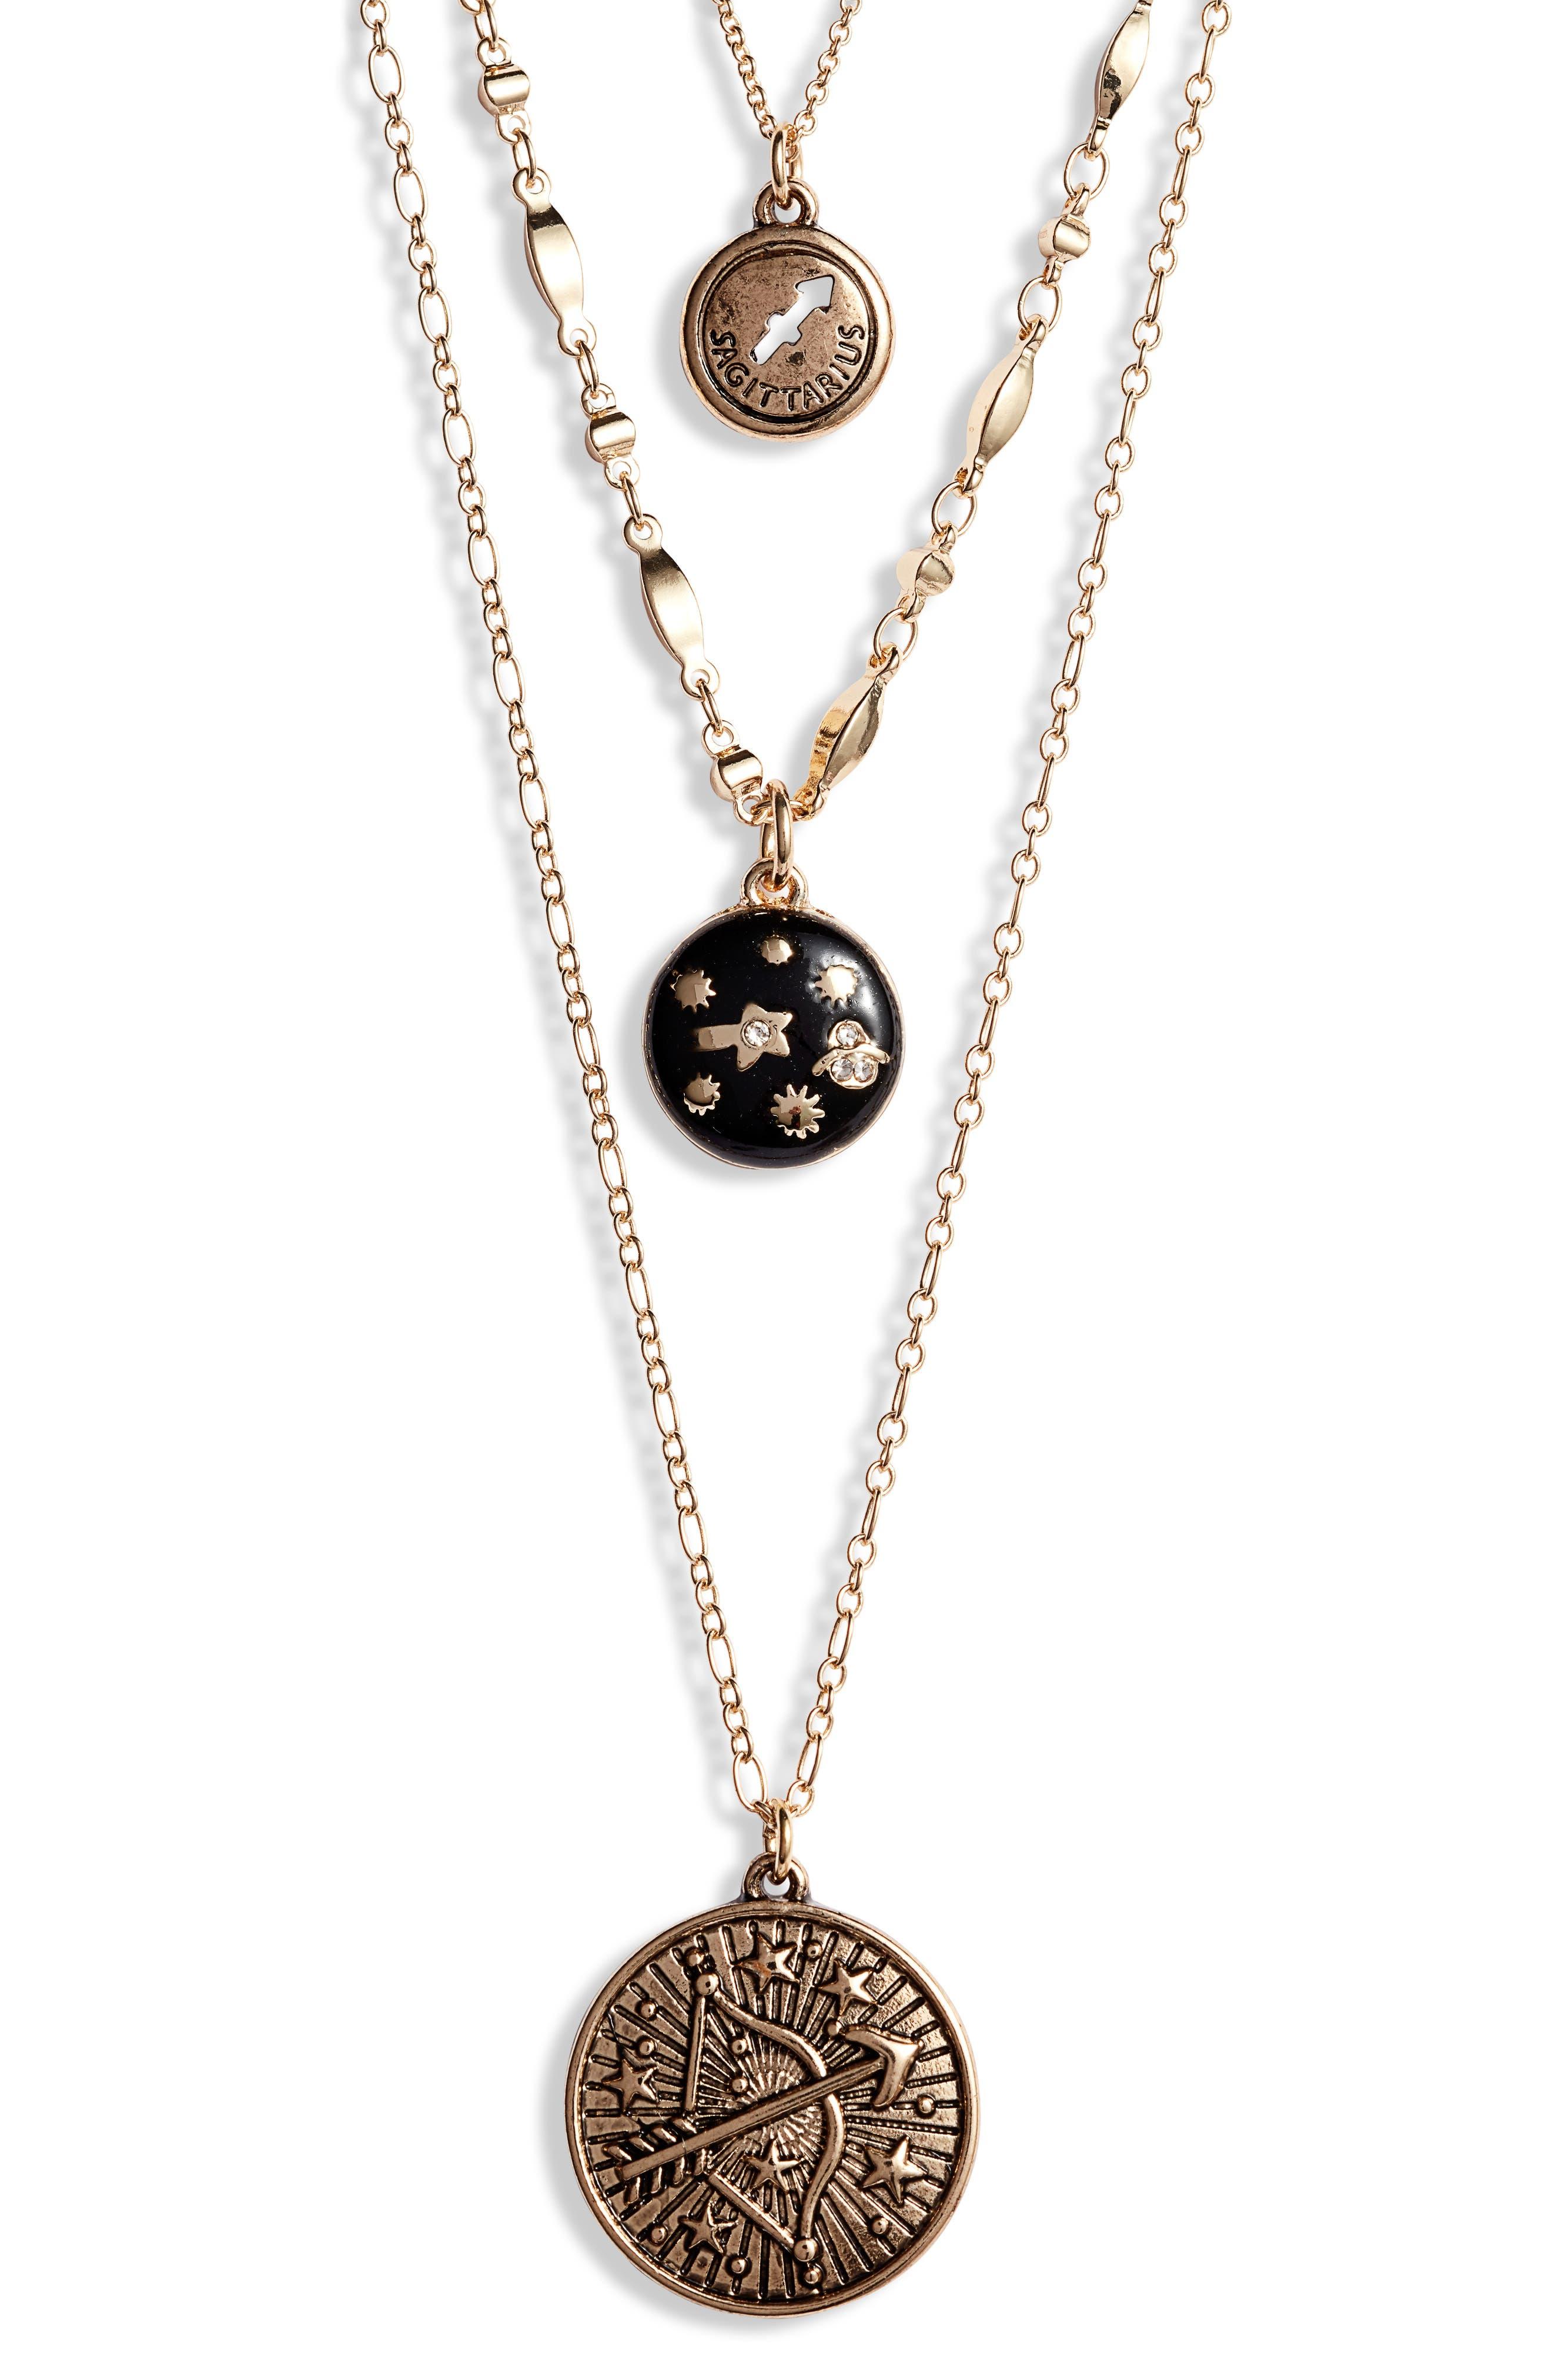 Sagittarius Astrological Charm Layered Necklace